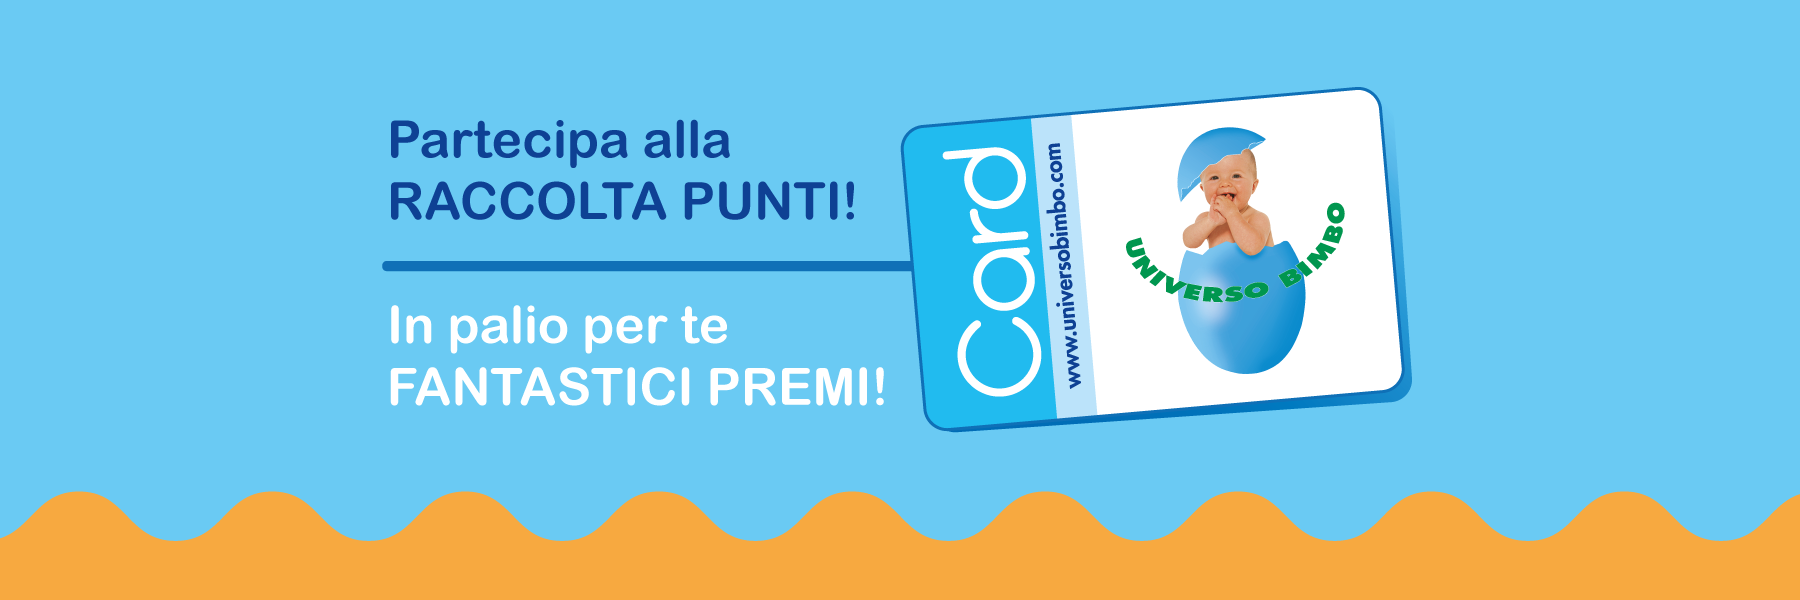 slide02_couponiamo_universobimbo